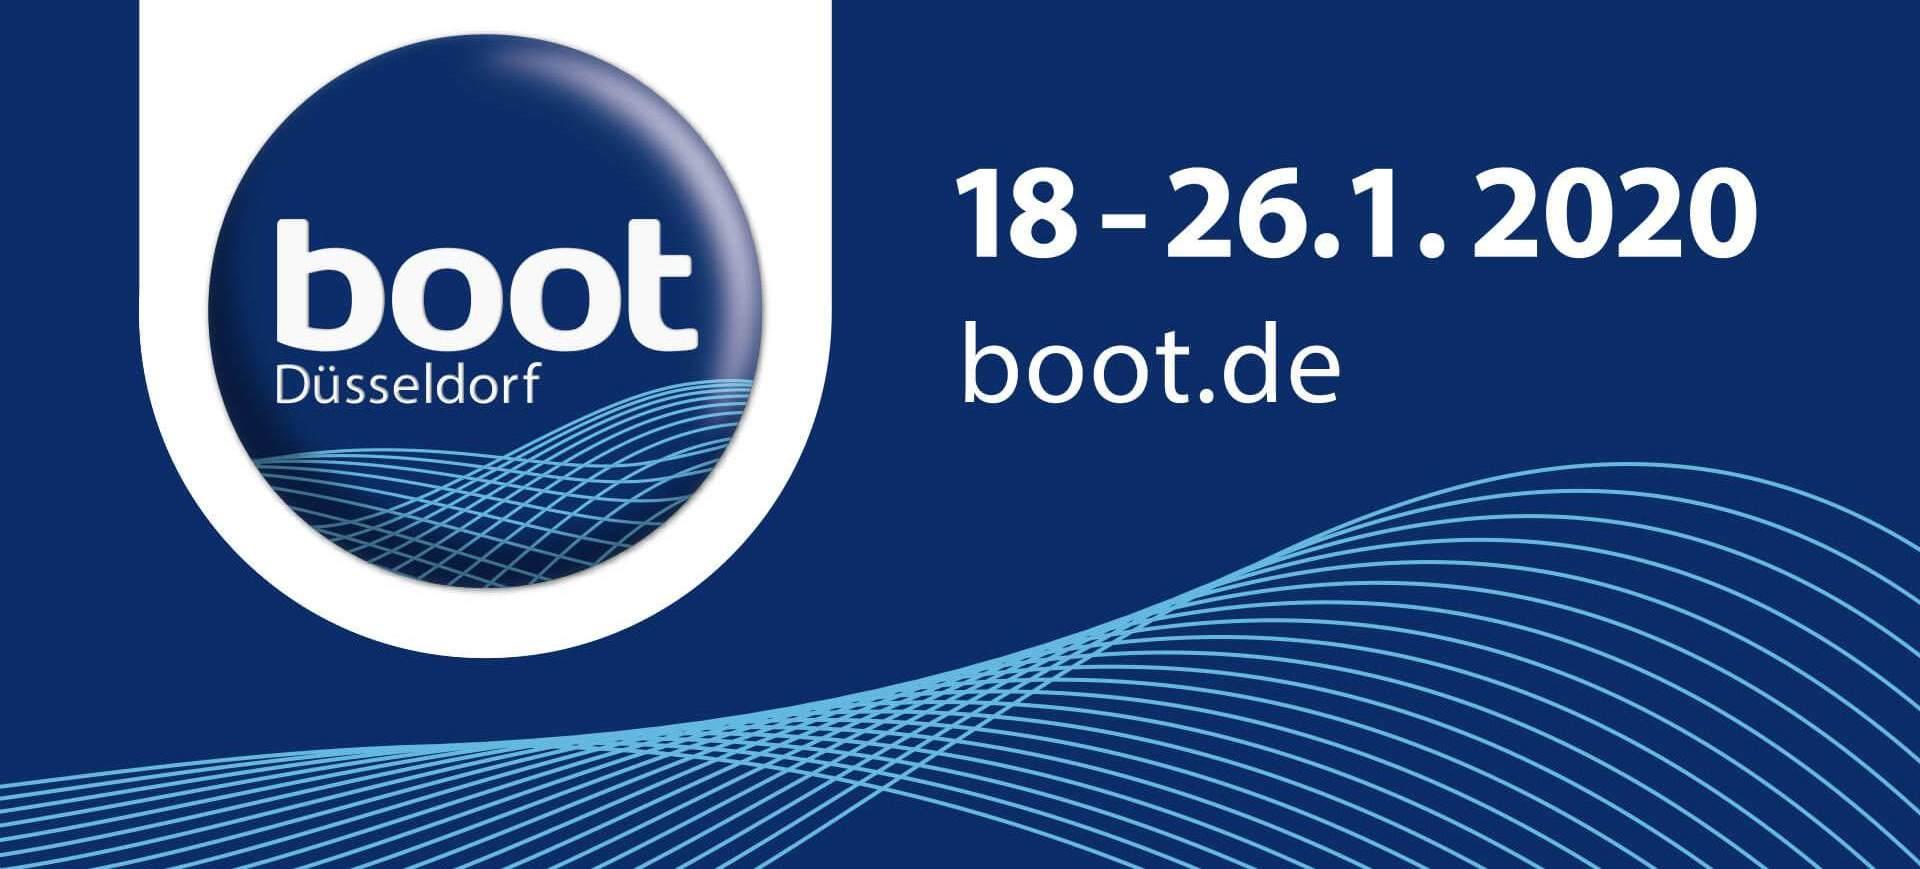 Düsseldorf Boat Show 2020 - 01R